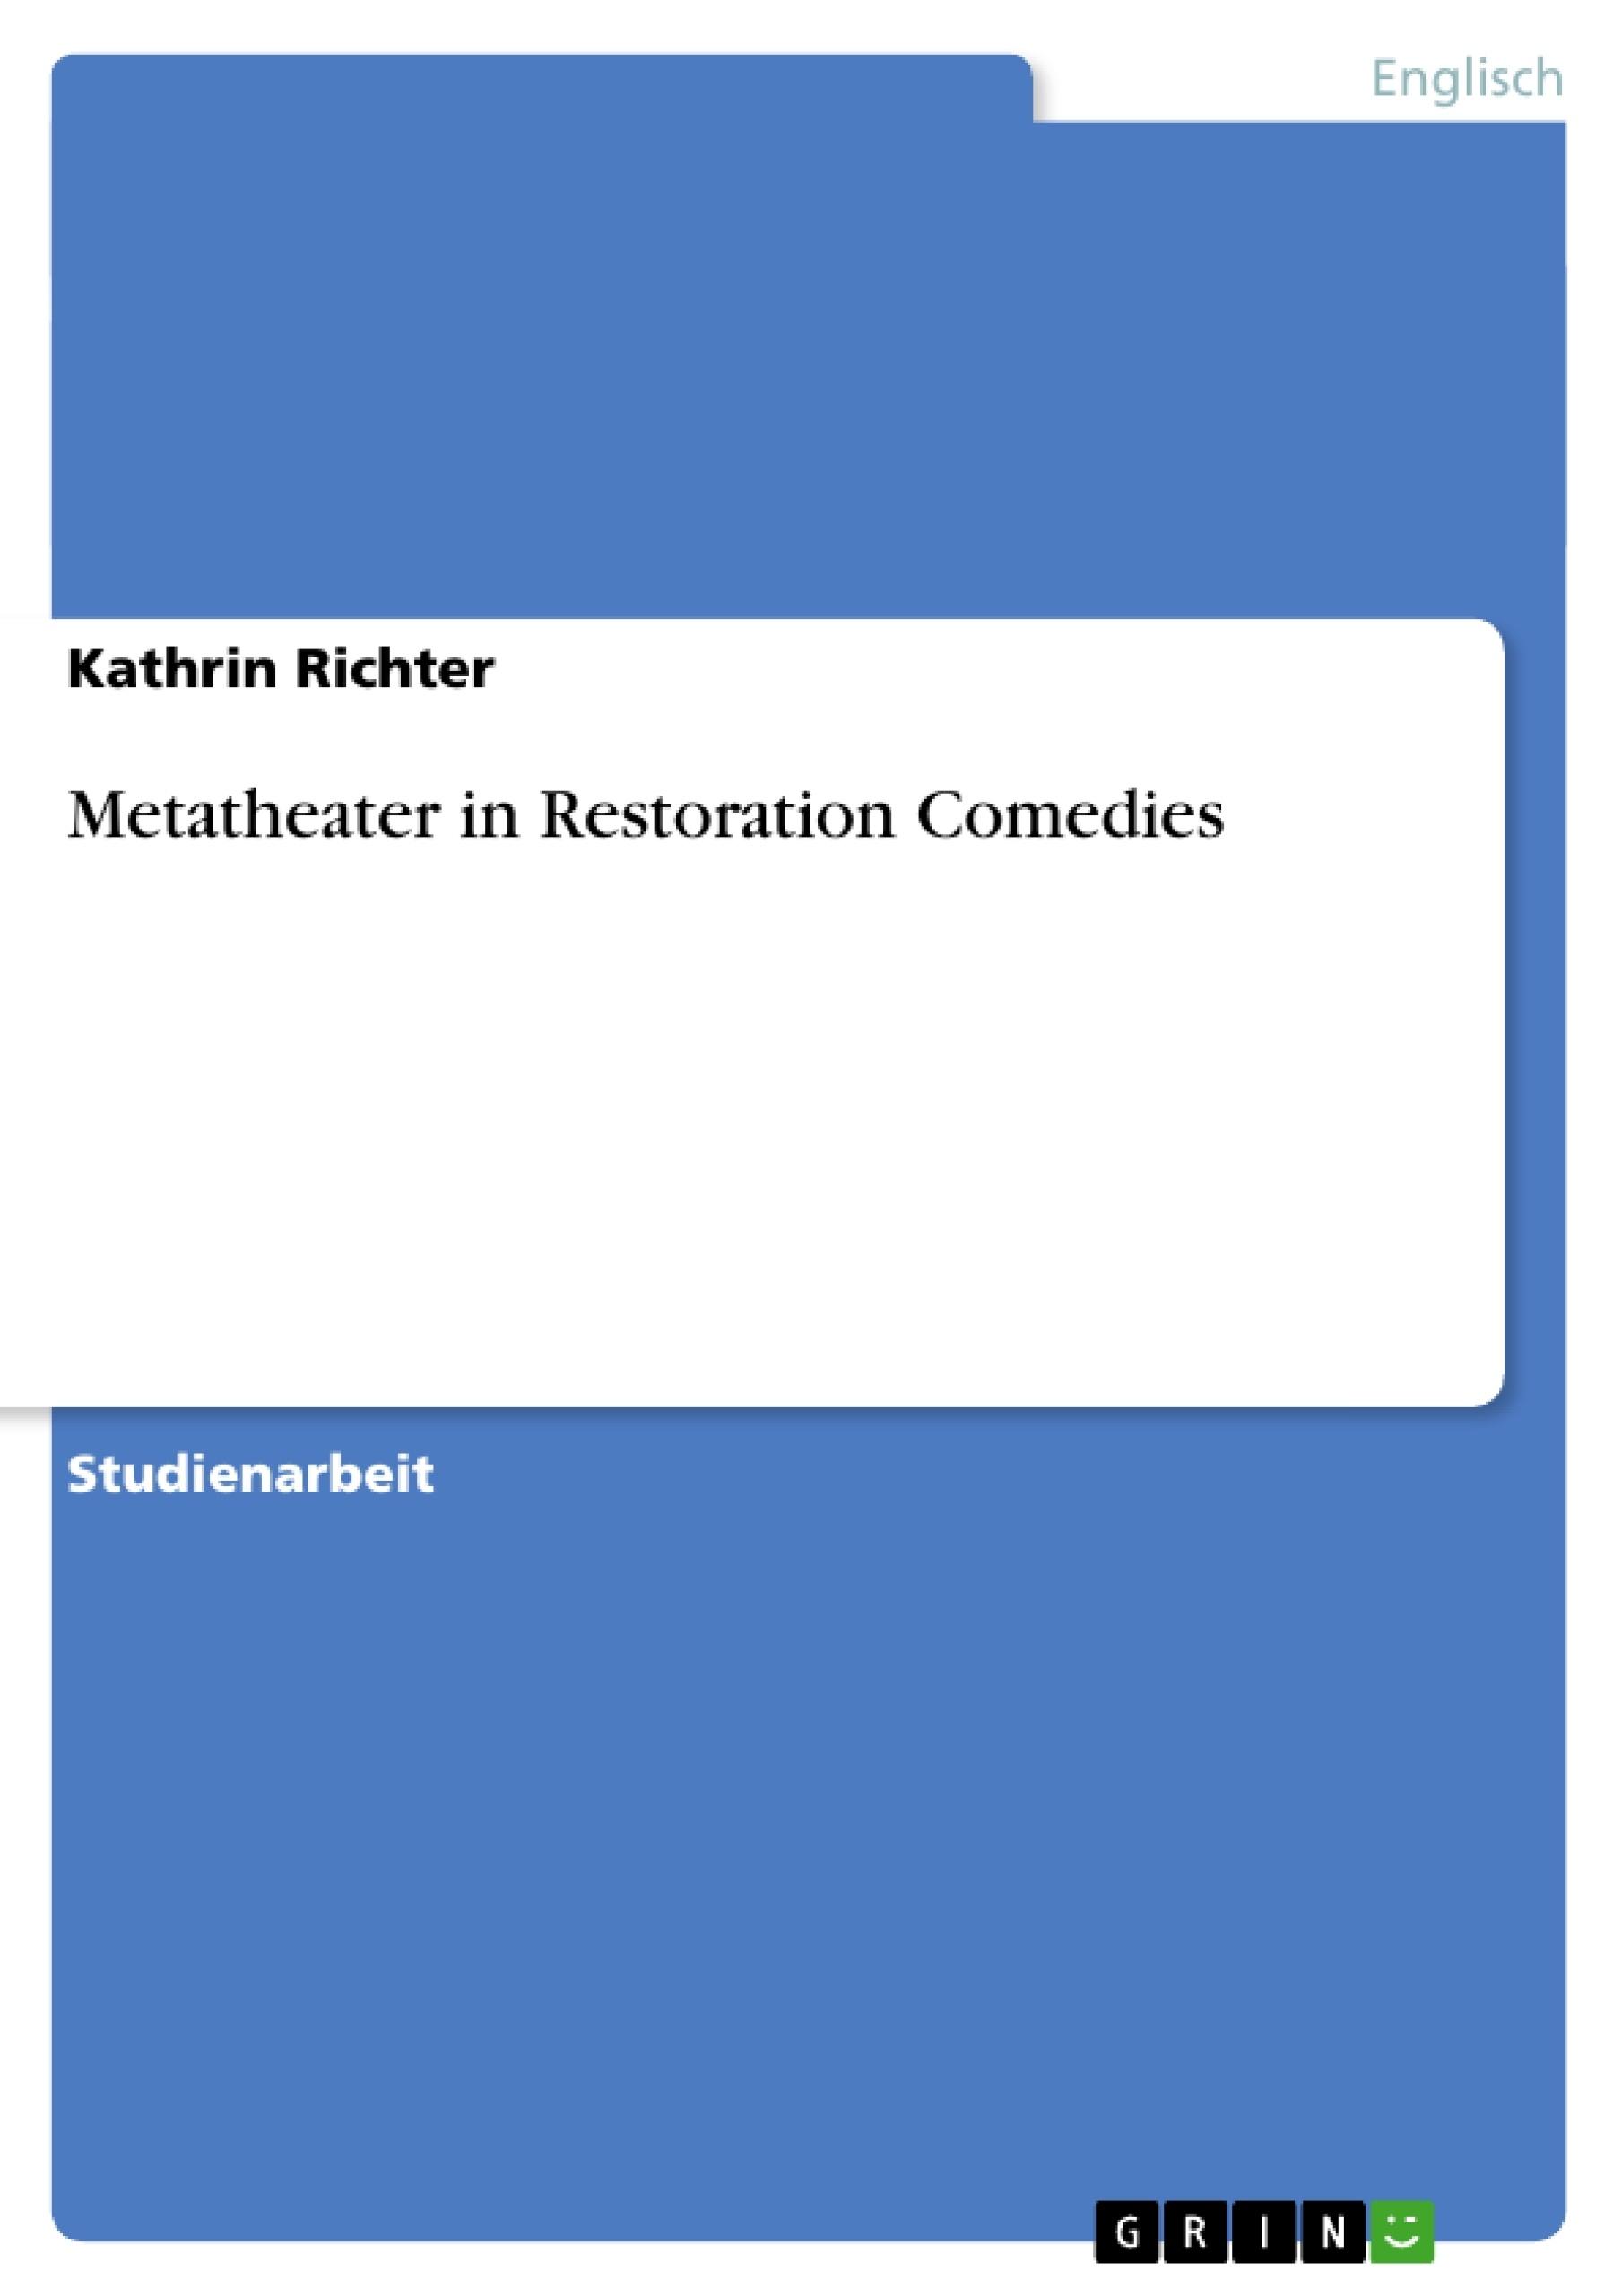 Titel: Metatheater in Restoration Comedies